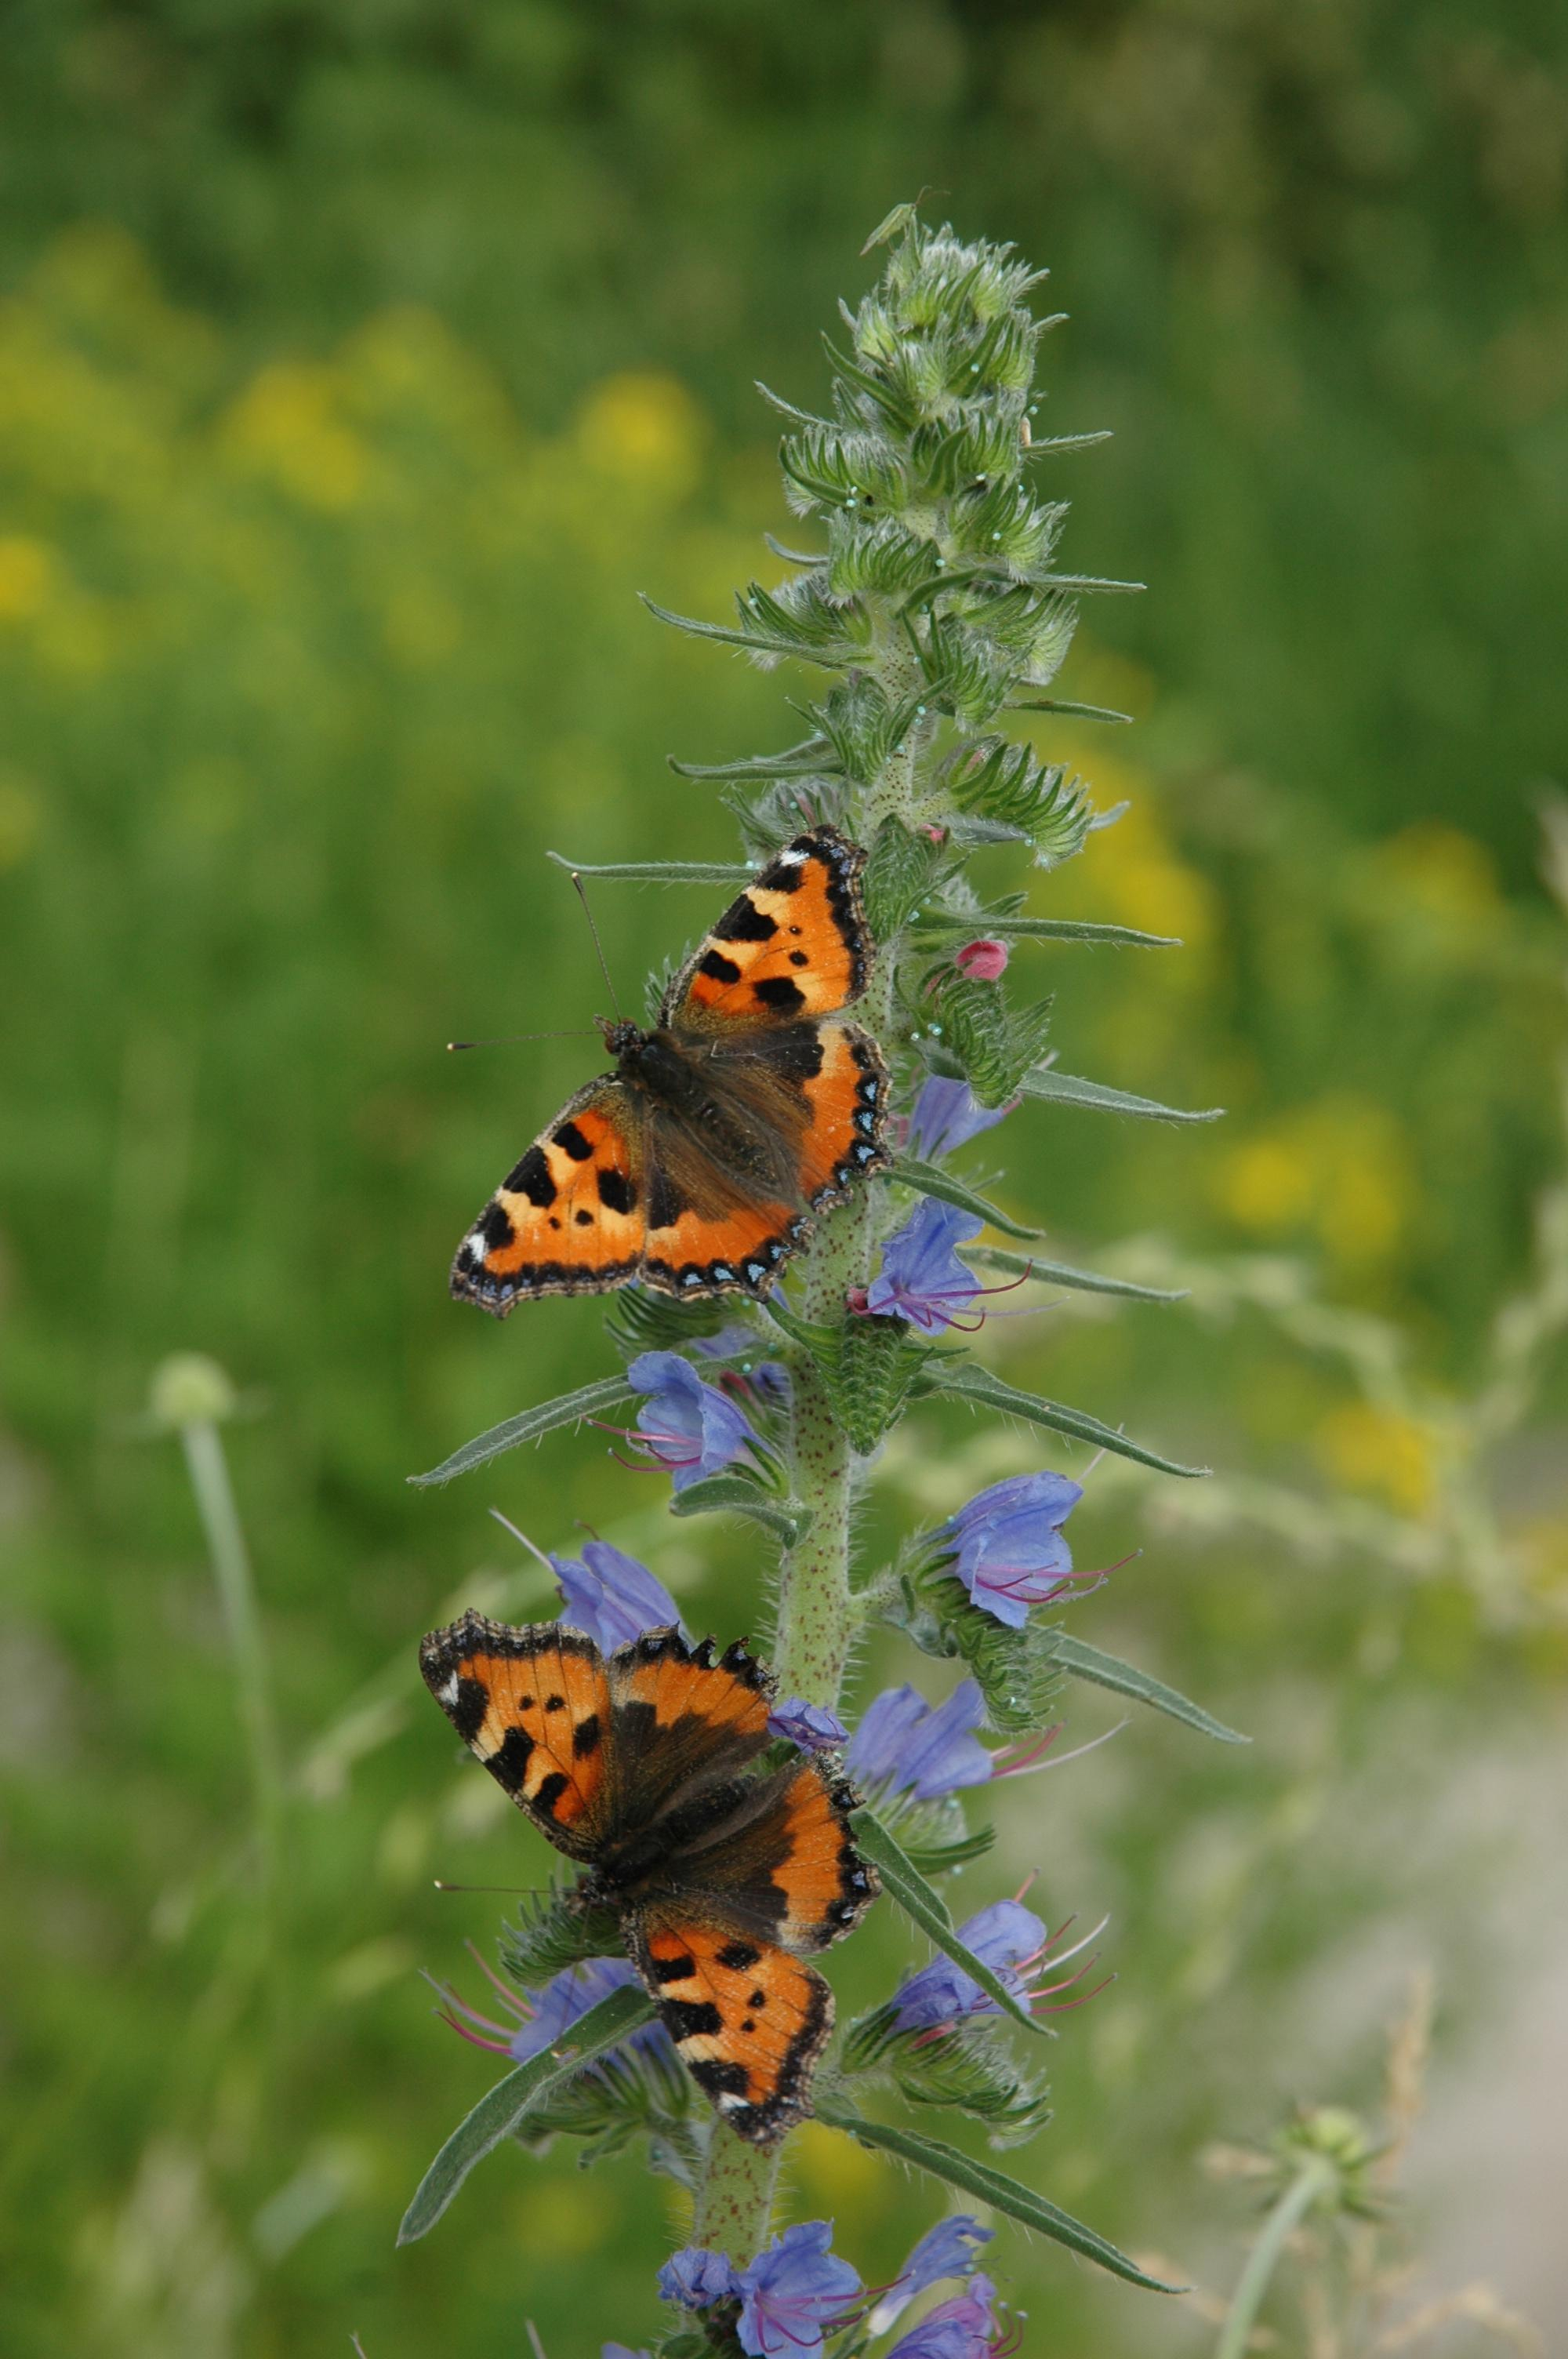 Spittelers Schmetterlingsweg